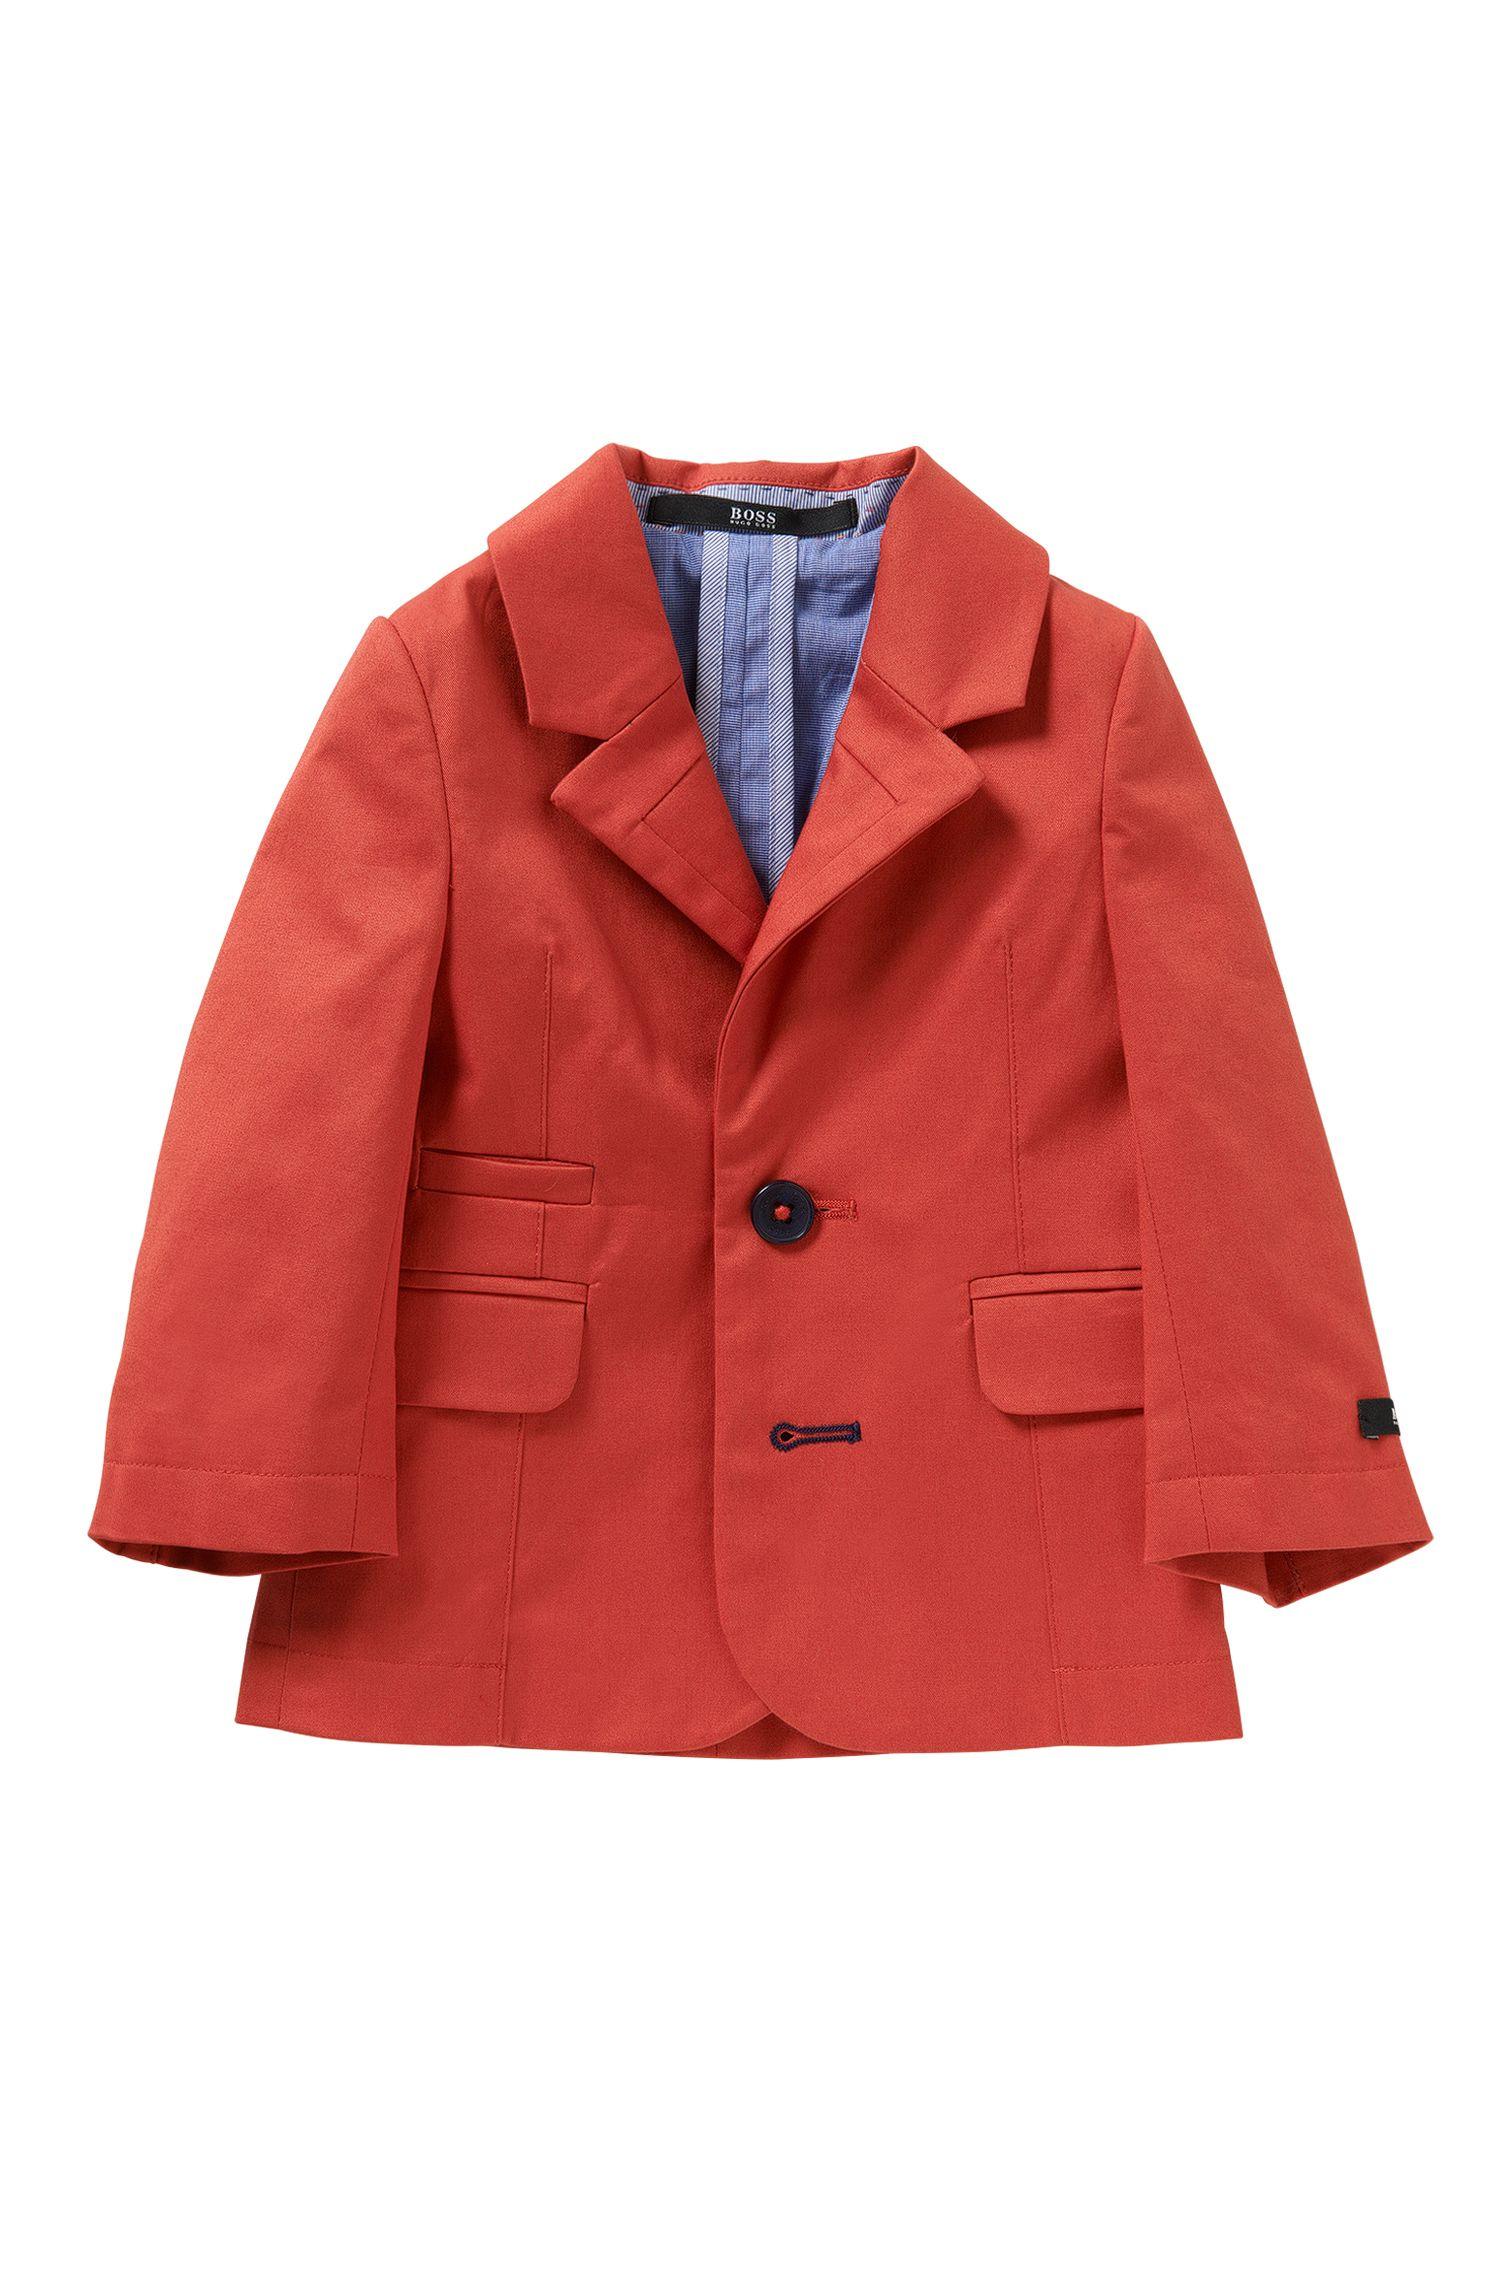 Plain-coloured newborns' jacket in stretch cotton: 'J06137'